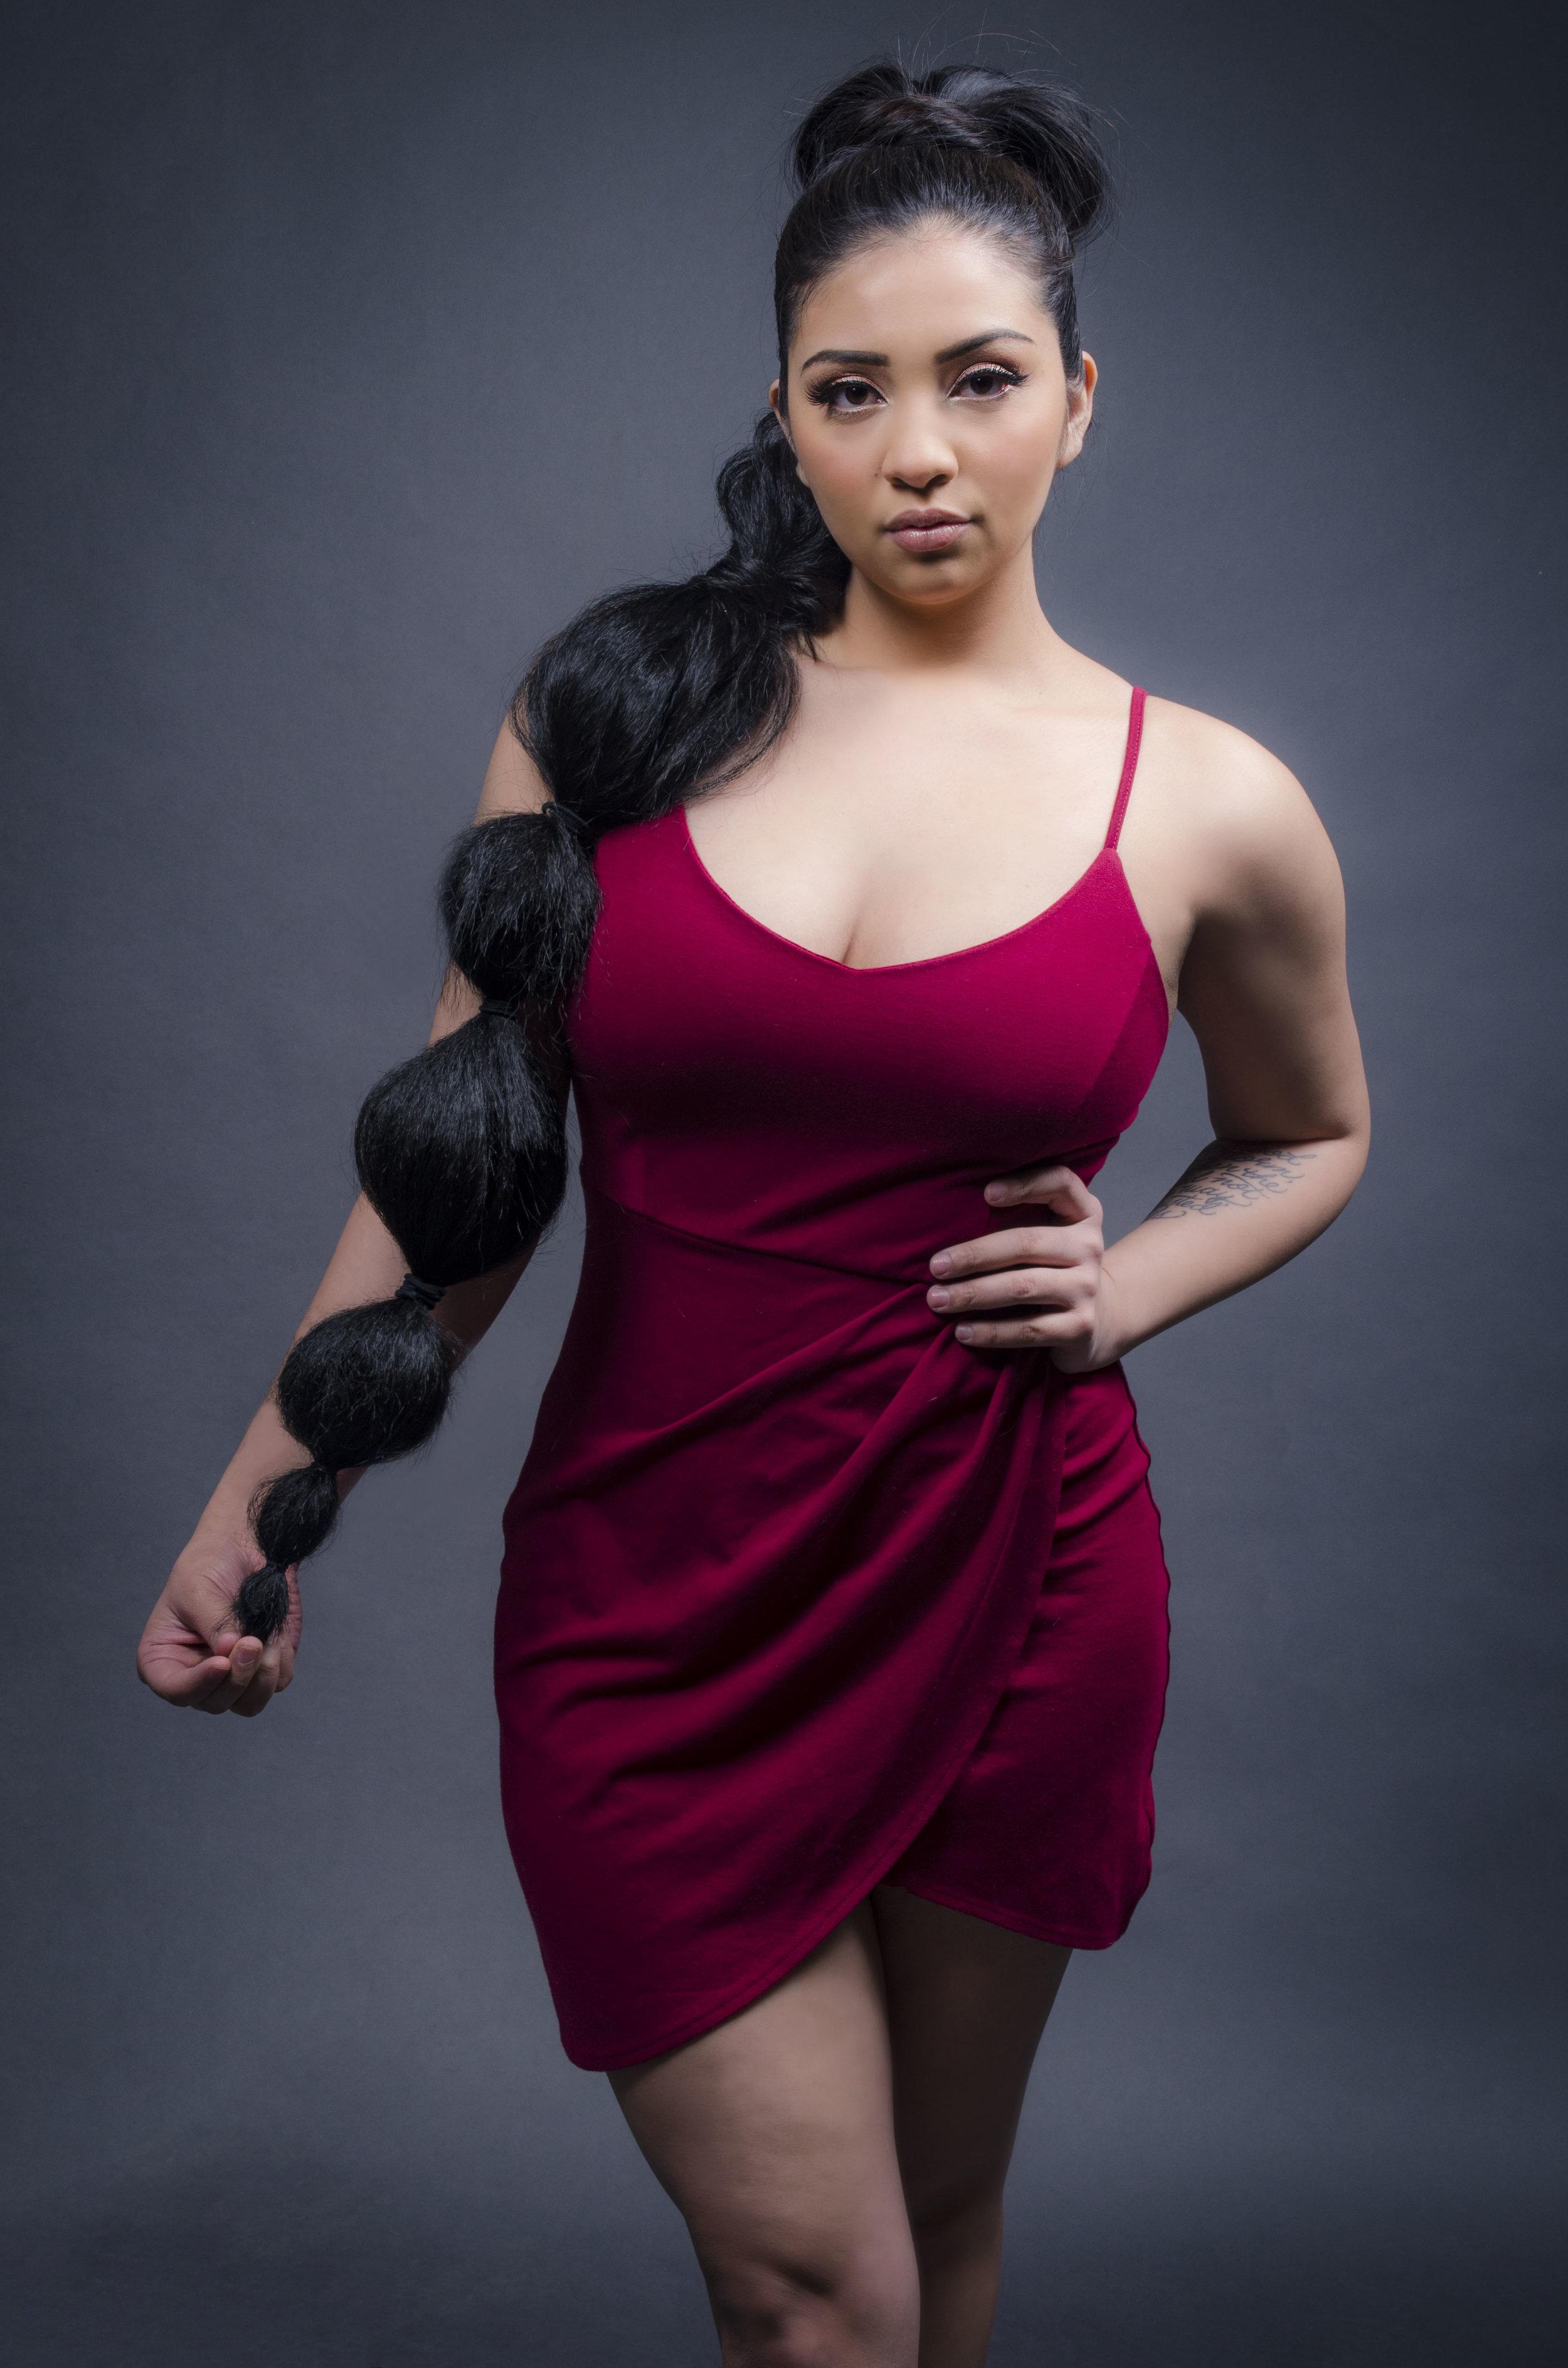 Susan Rojas